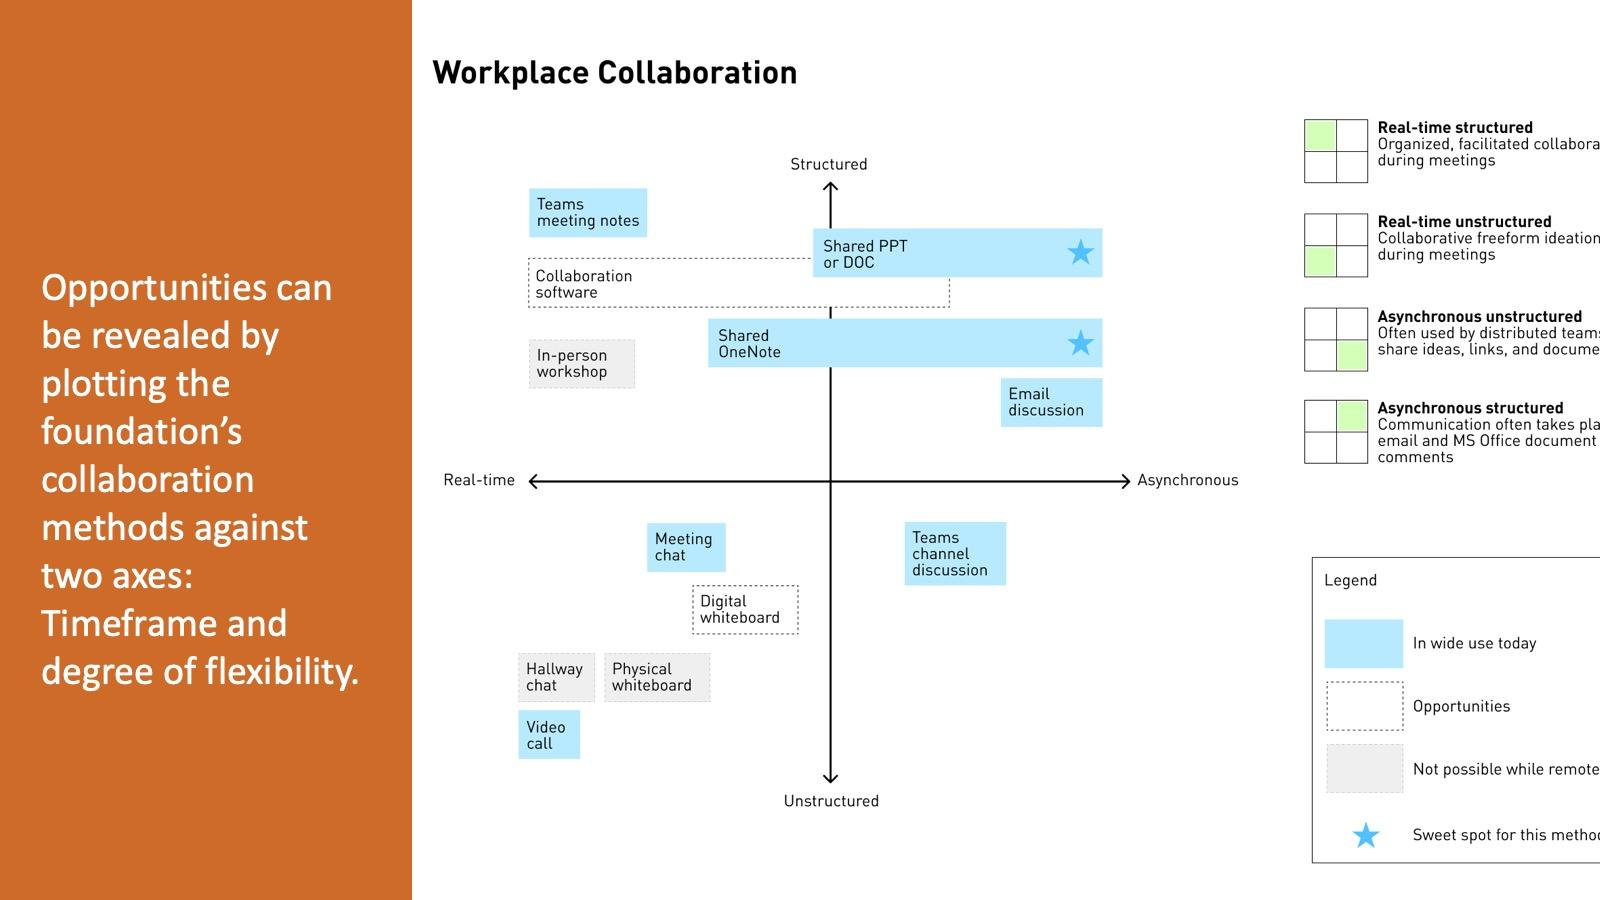 Workplace Collaboration Matrix